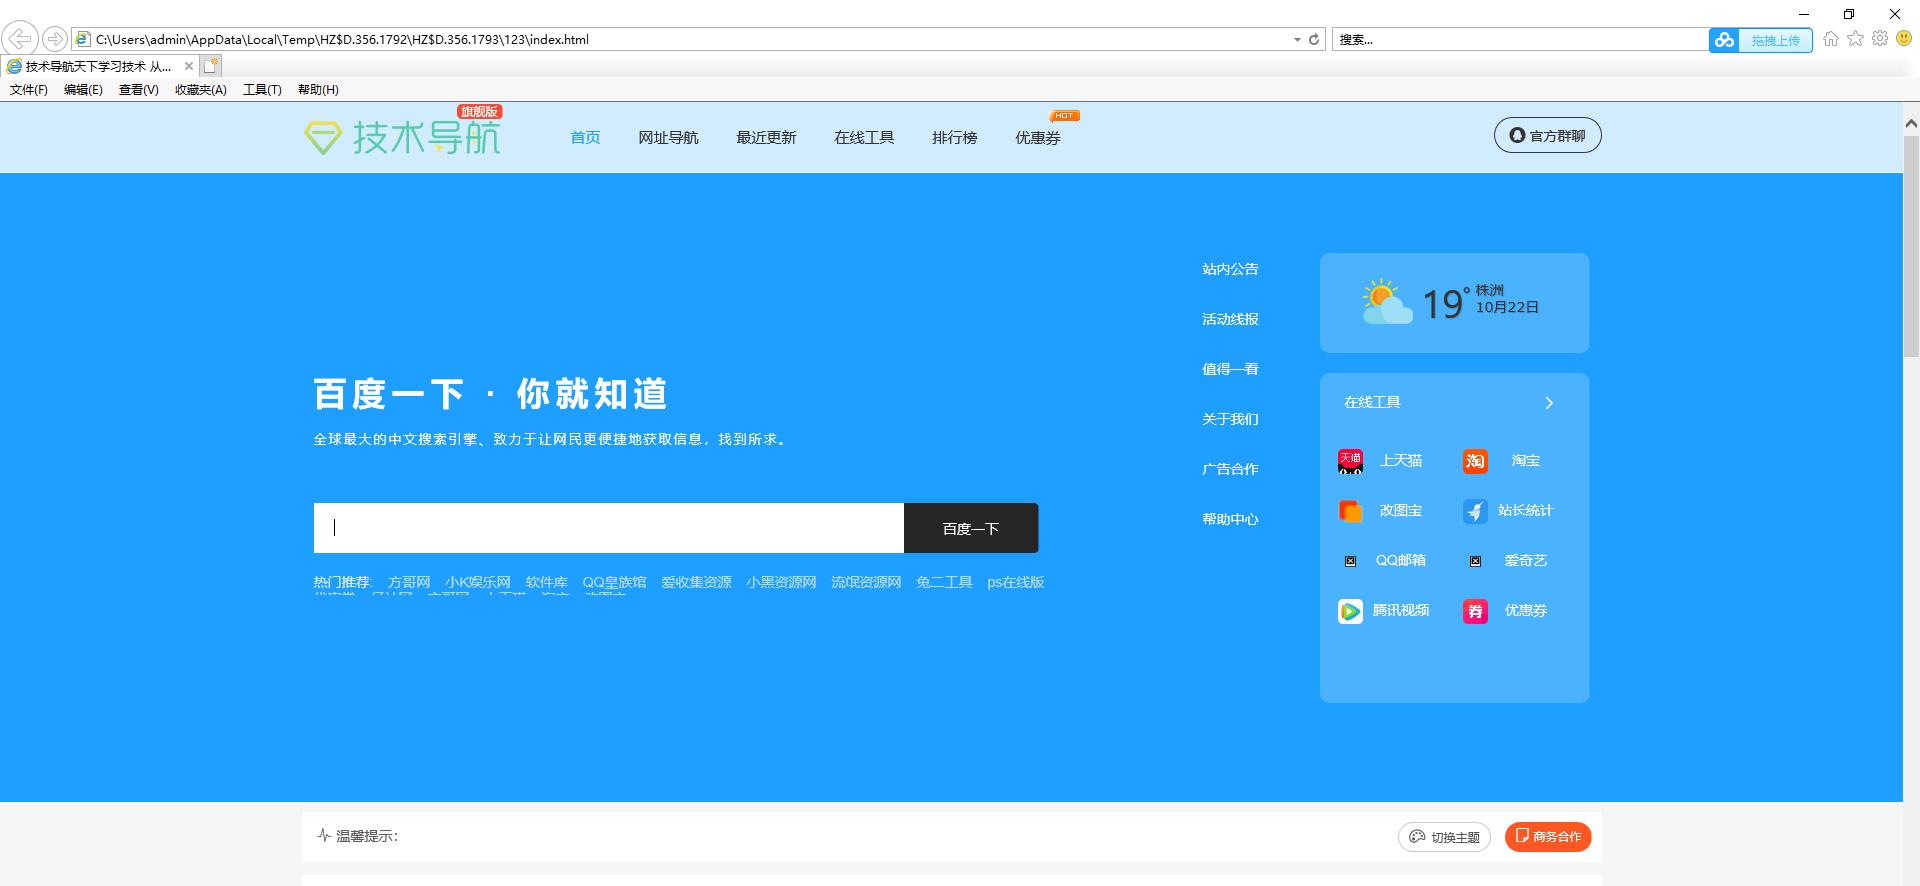 QQ技术网网址导航源码